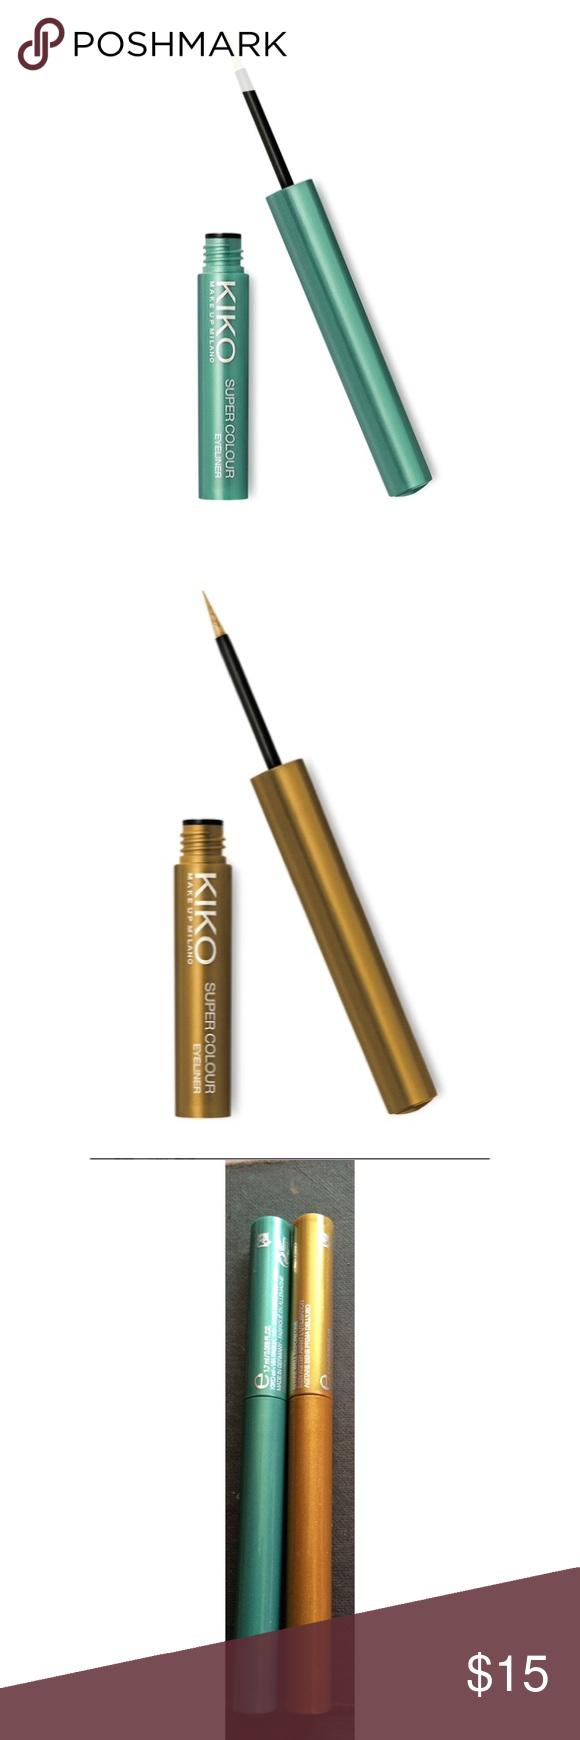 KIKO cosmetics super color eyeliner💋 105 and 101 Brand new